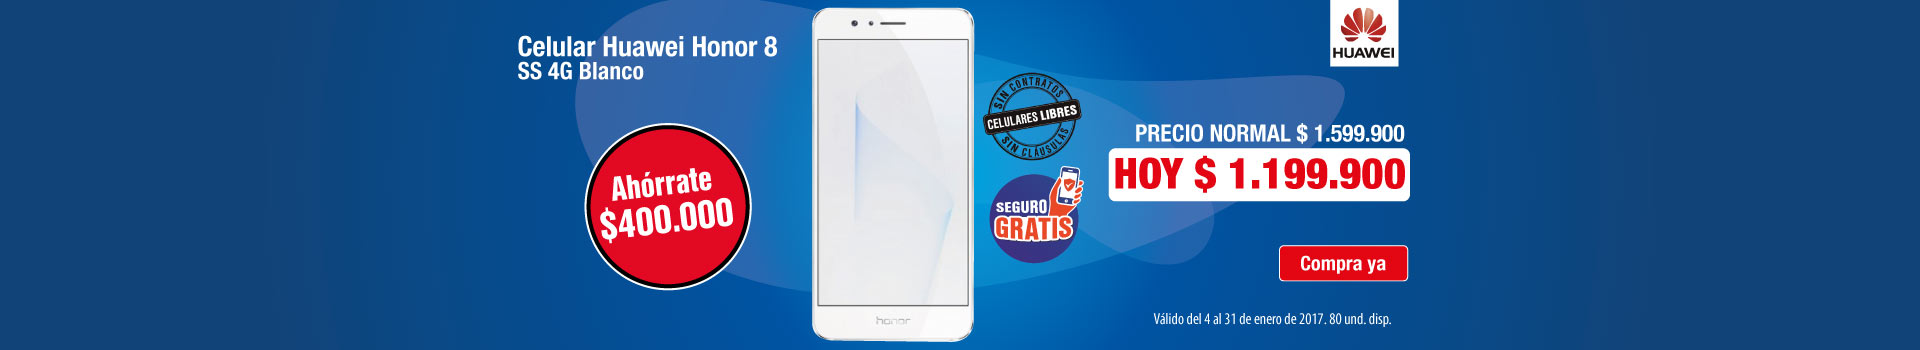 HIPER AK KT - Ahorra $400.000 en Celular HUAWEI Honor Blanco - Ene18